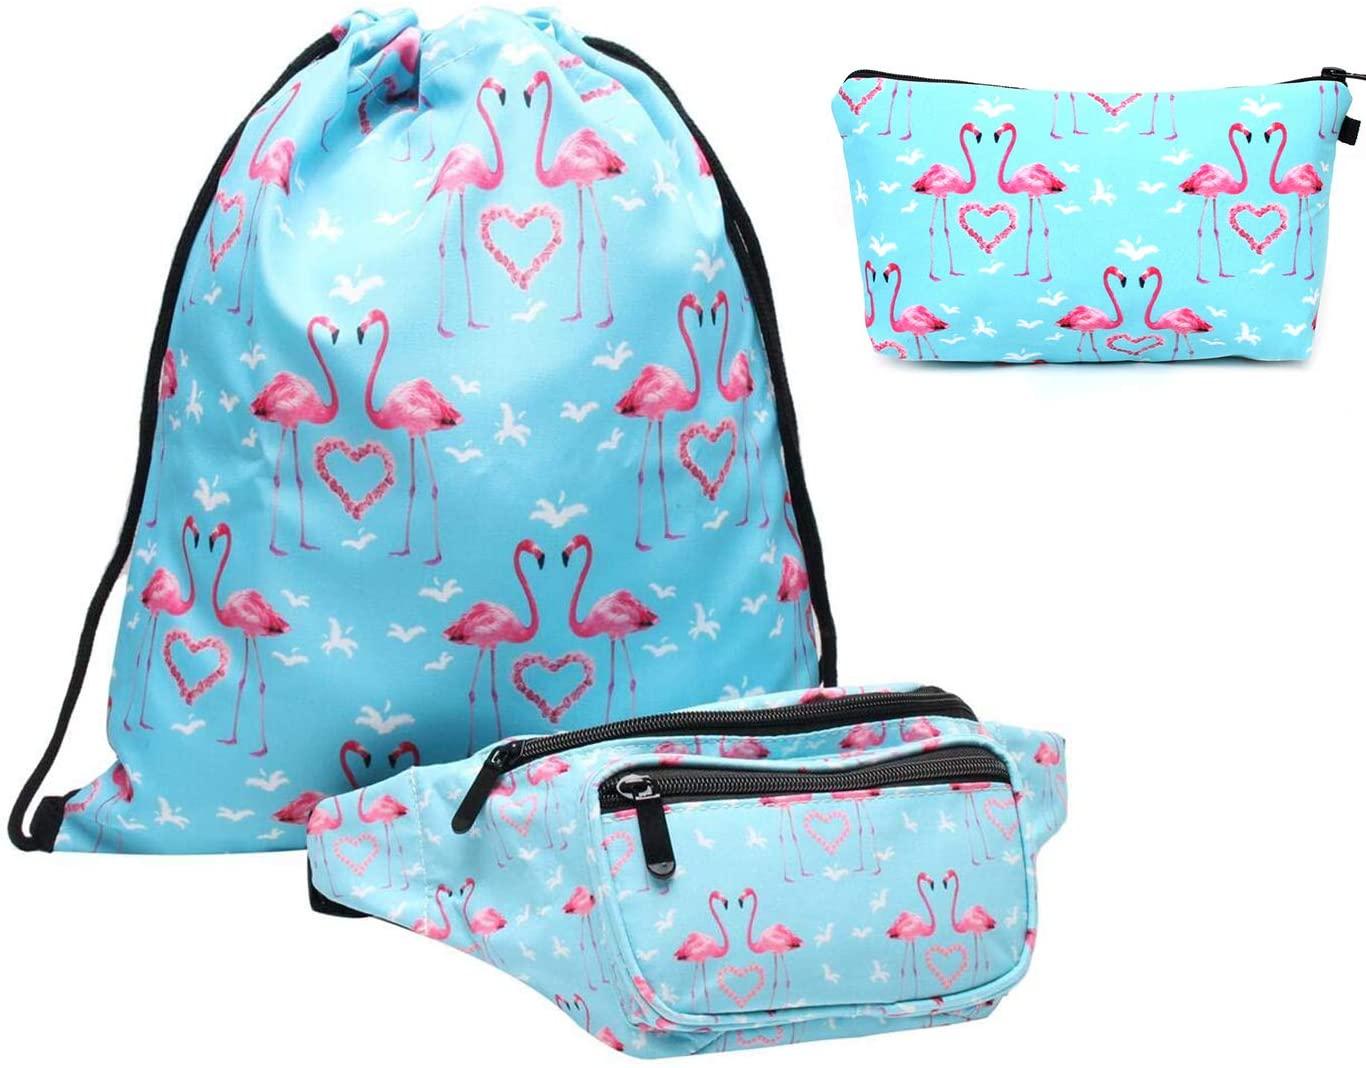 HELLATHUND Fanny Pack Set Unicorn Gifts Travel Backpack Drawstring Bag Waist Bag Set for Teens Girls(Pack of 3)